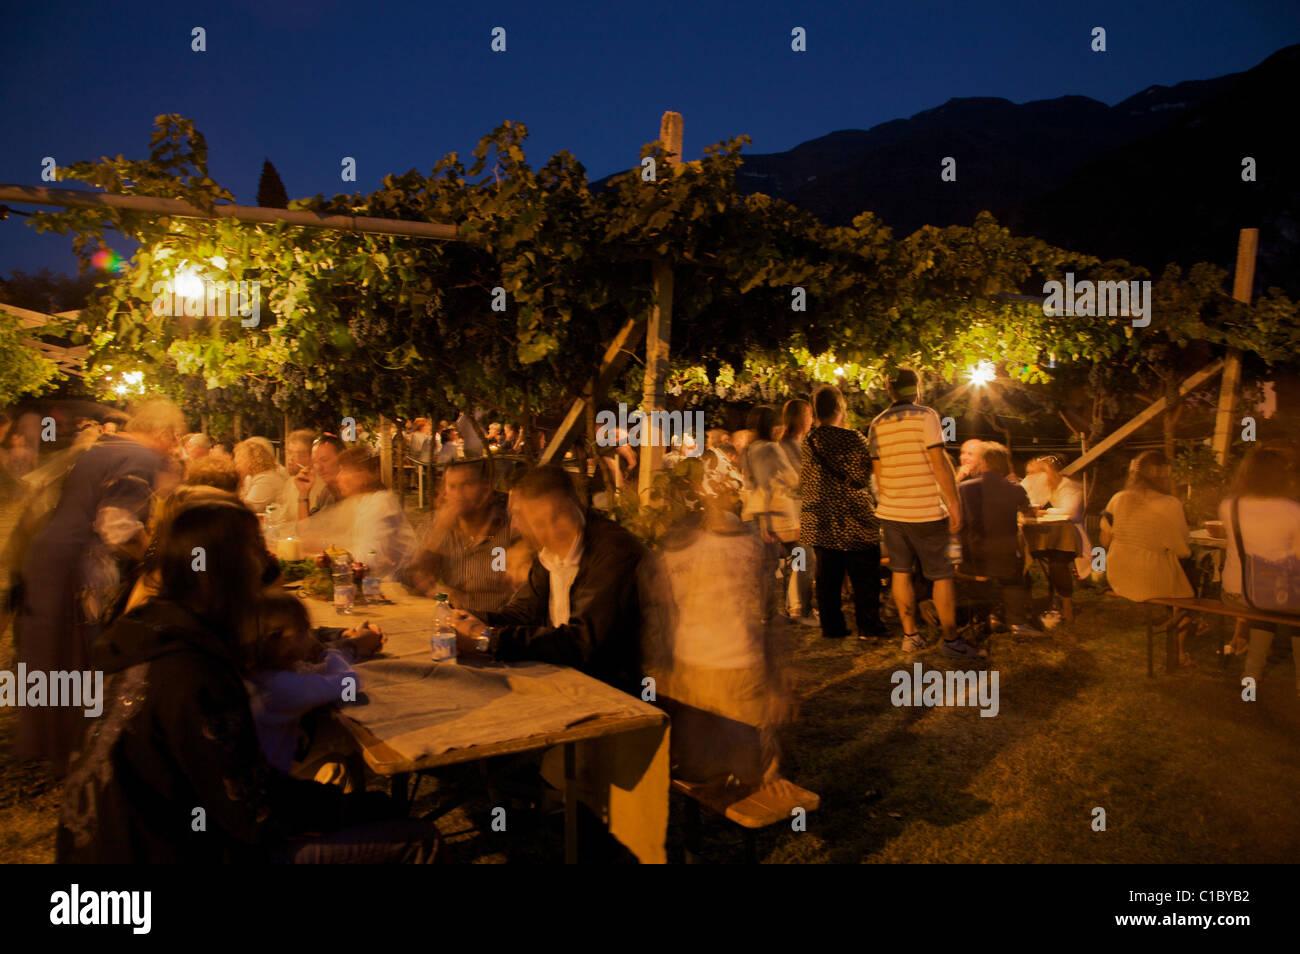 Uva e dintorni fest, Sabbionara d'Avio, Vallagarina, Trentino Alto Adige, Italy - Stock Image